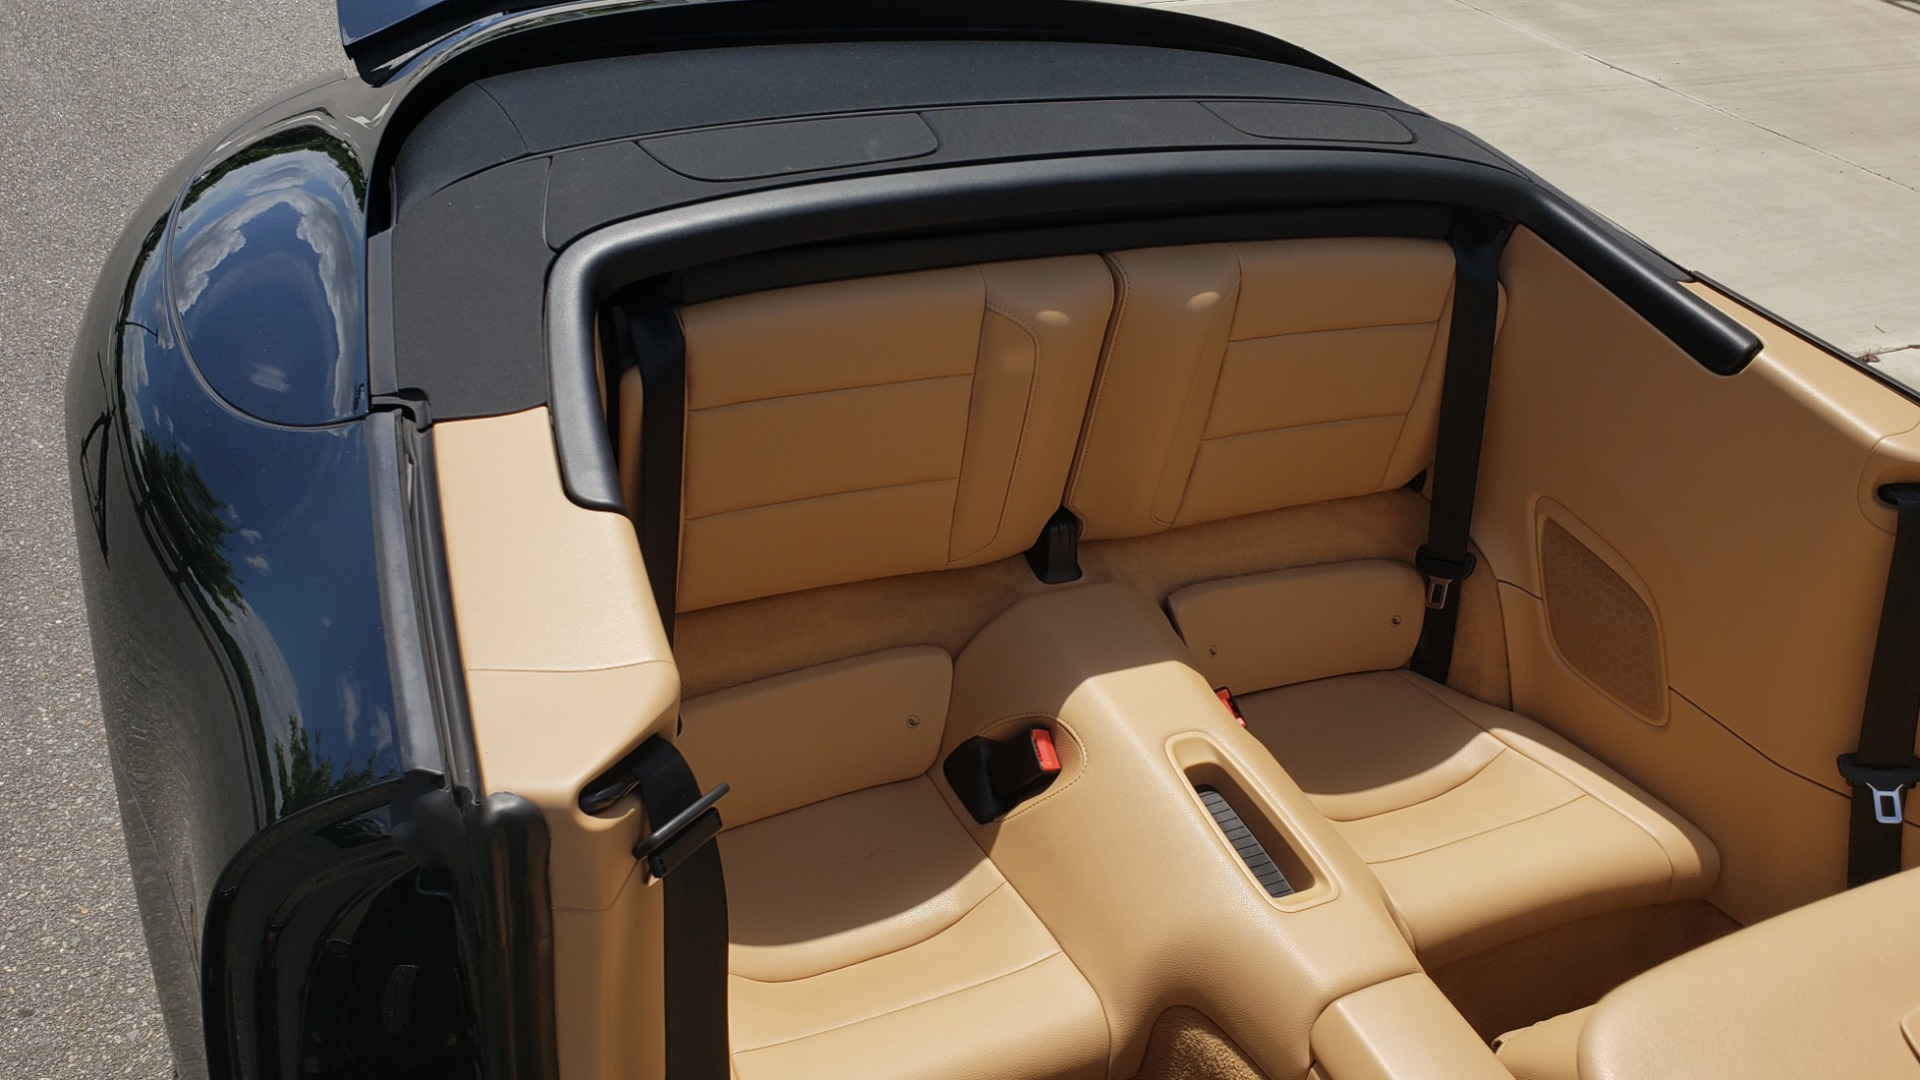 Used 2014 Porsche 911 CARRERA S CABRIOLET / PREM PKG / PDK / NAV / BOSE / SPORT CHRONO for sale $81,995 at Formula Imports in Charlotte NC 28227 48